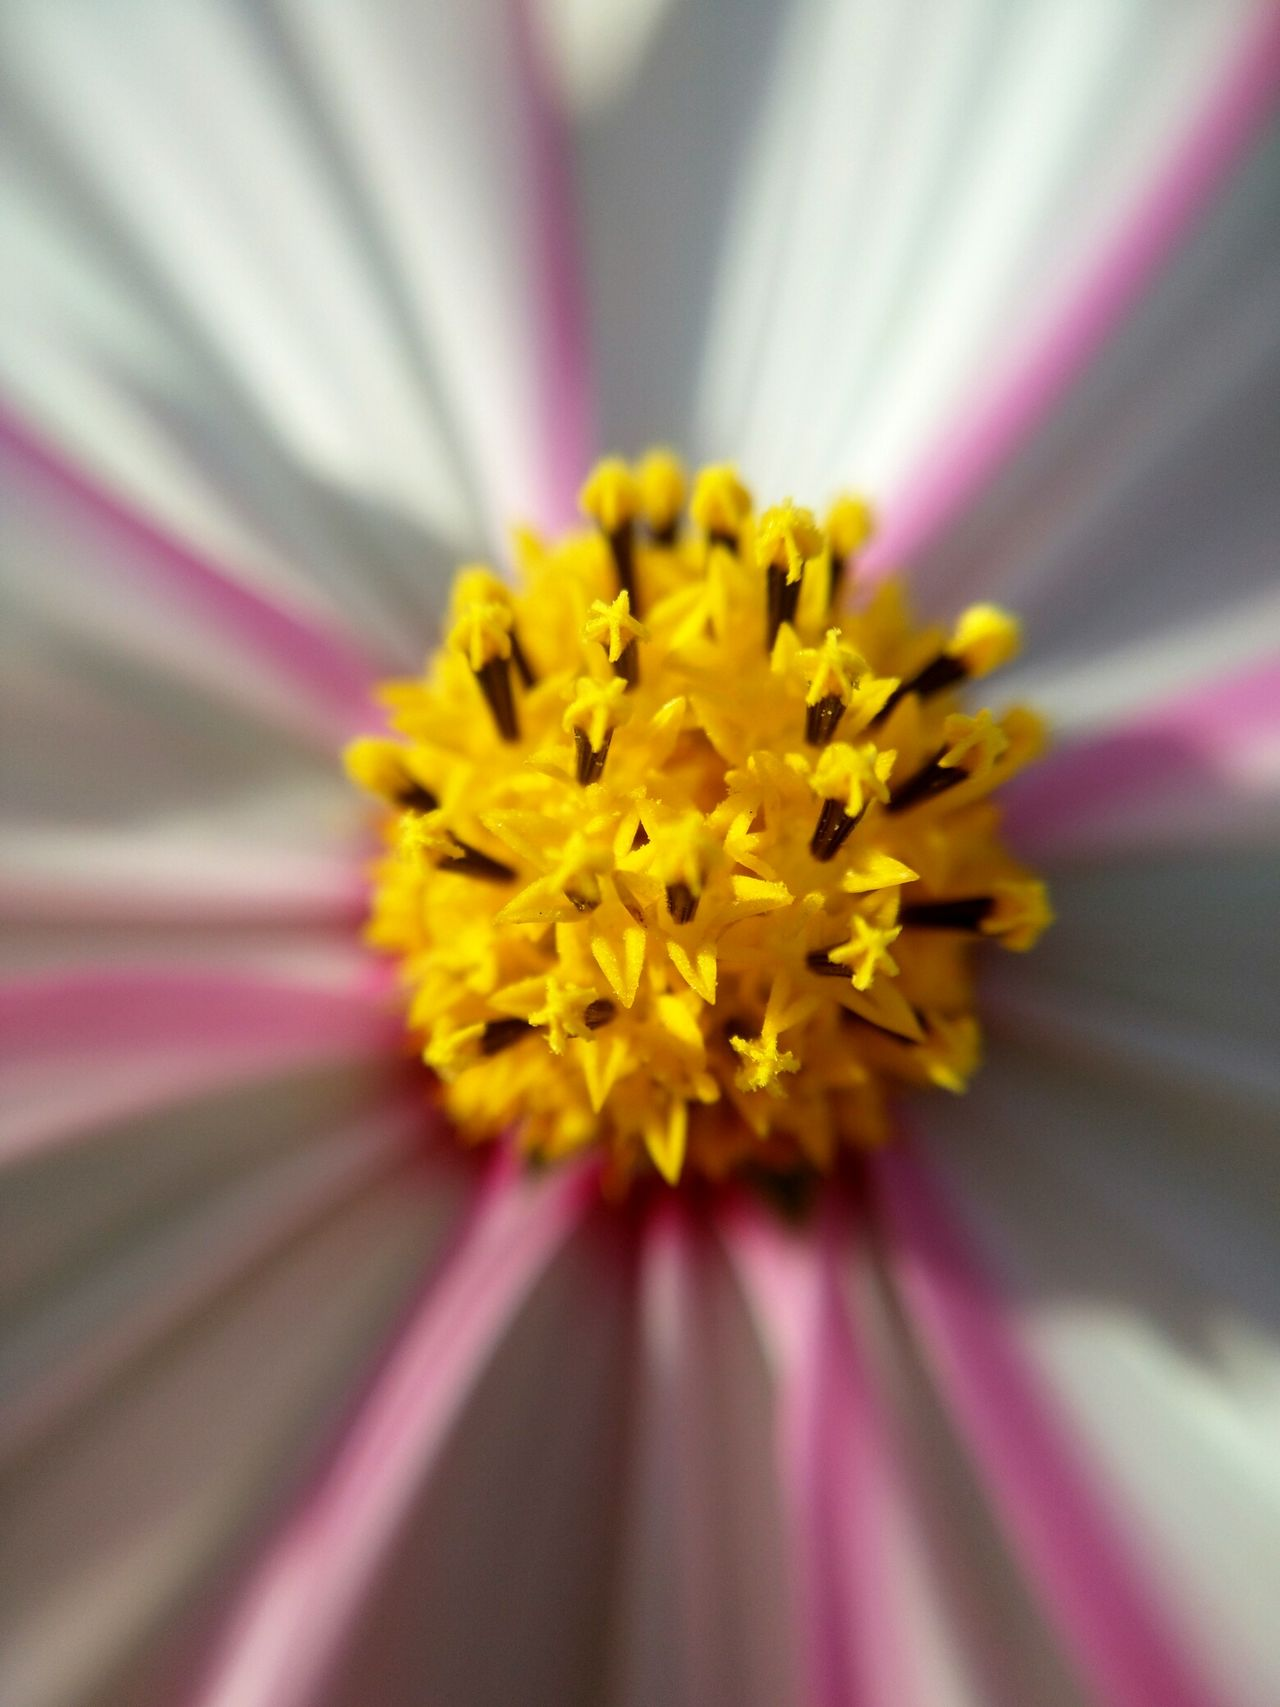 Pertect Masterpiece From God Flower Heart Pink Flower Yellow Center